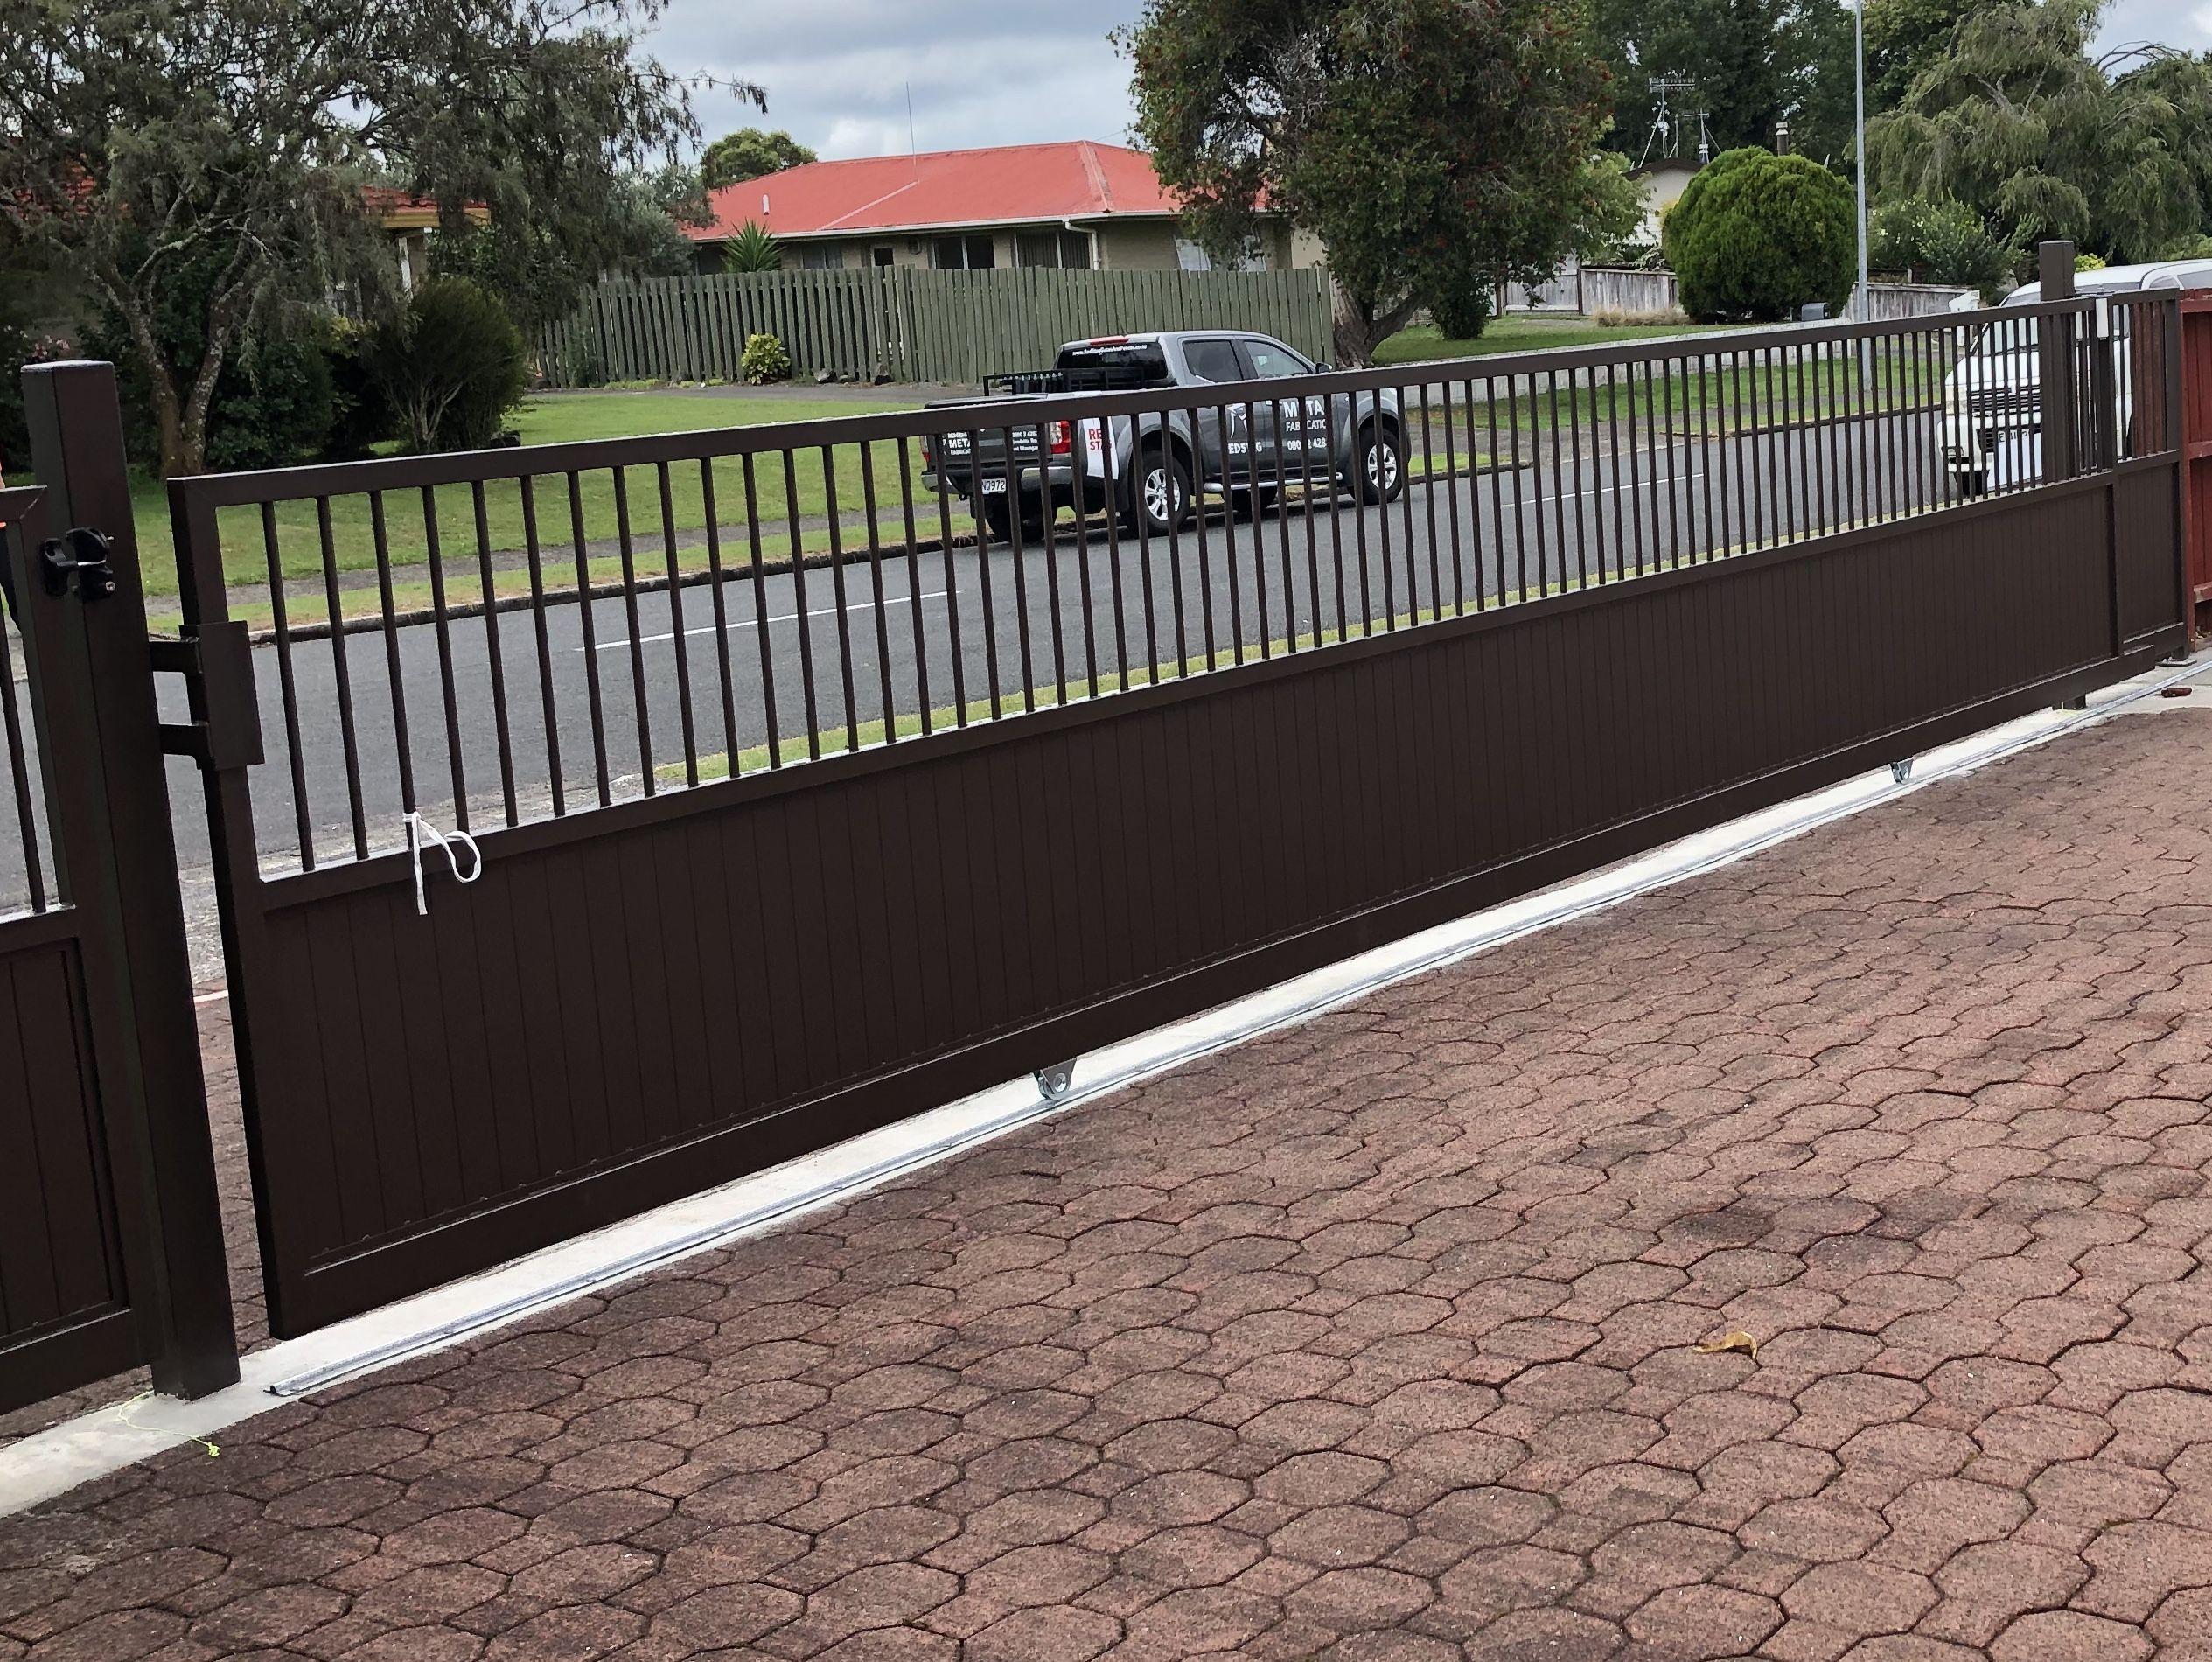 Tongue And Groove Sliding Gate 8m Long Wedge Design Sliding Gate Fence Design Aluminium Gates